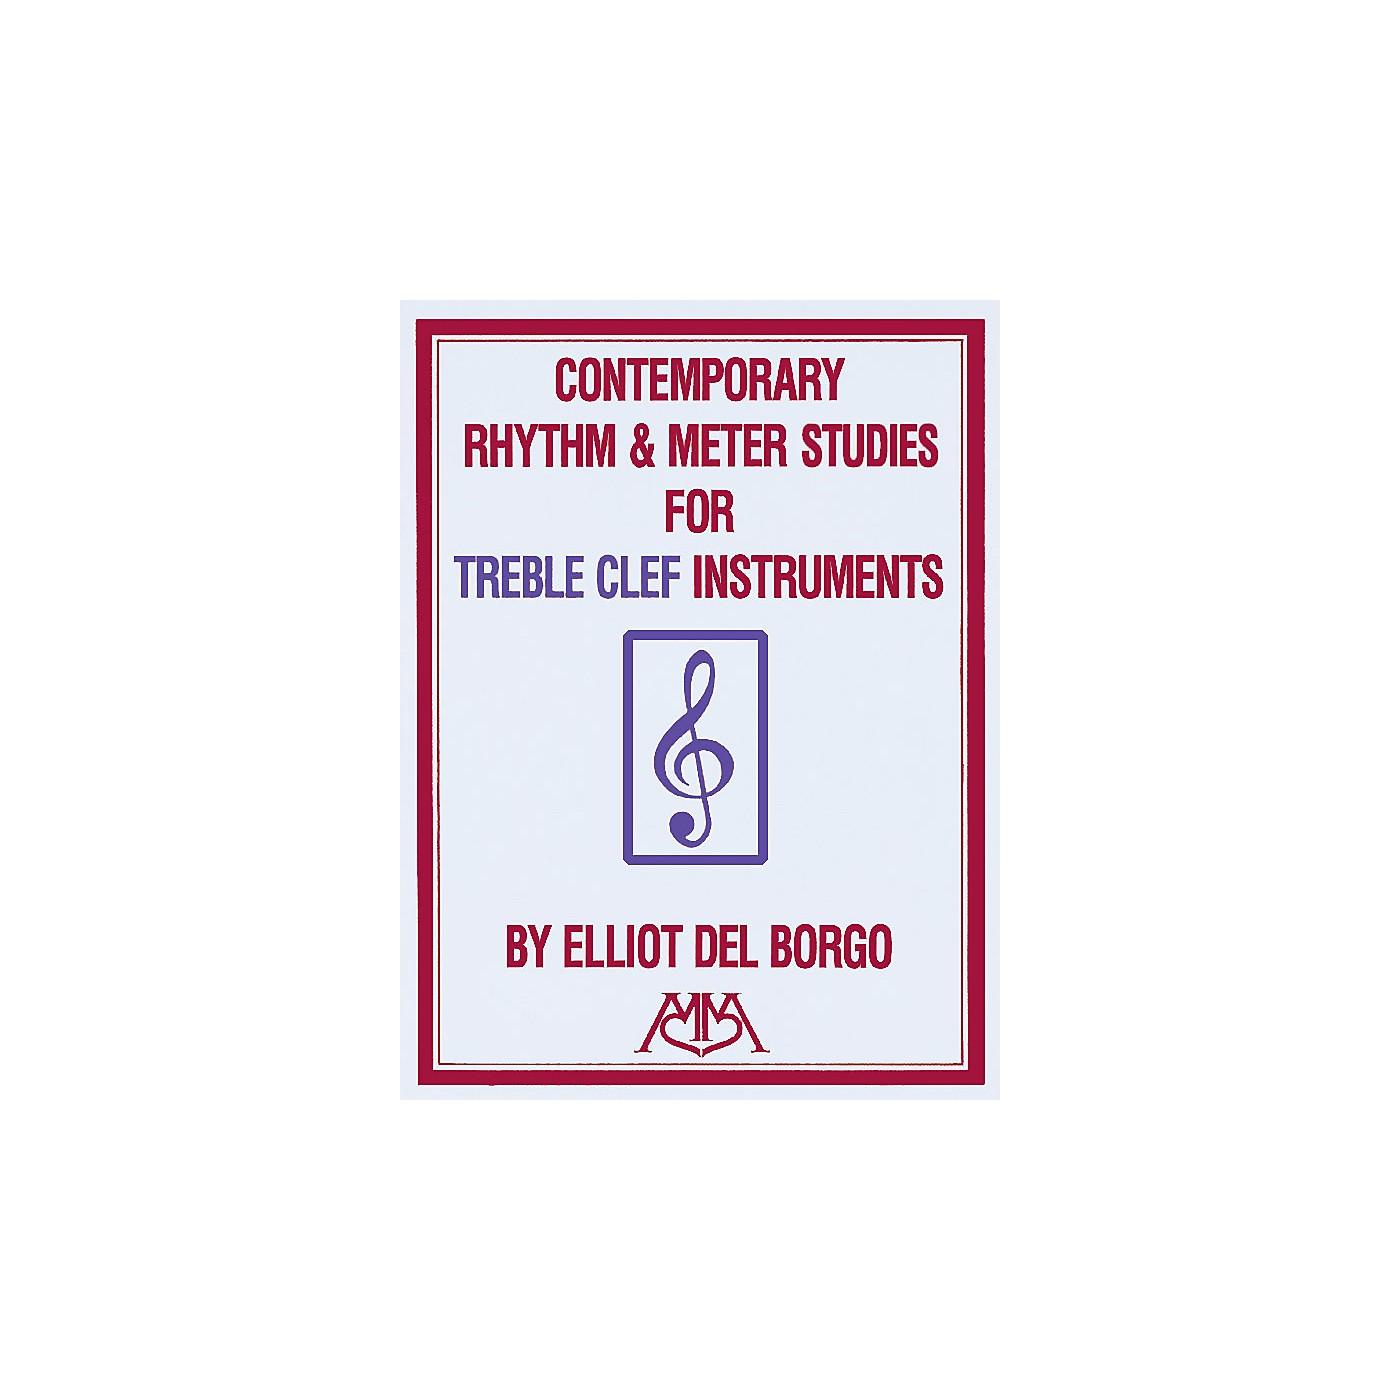 Hal Leonard Contemporary Rhythm and Meter Studies Meredith Music Resource Series by Elliot DelBorgo thumbnail